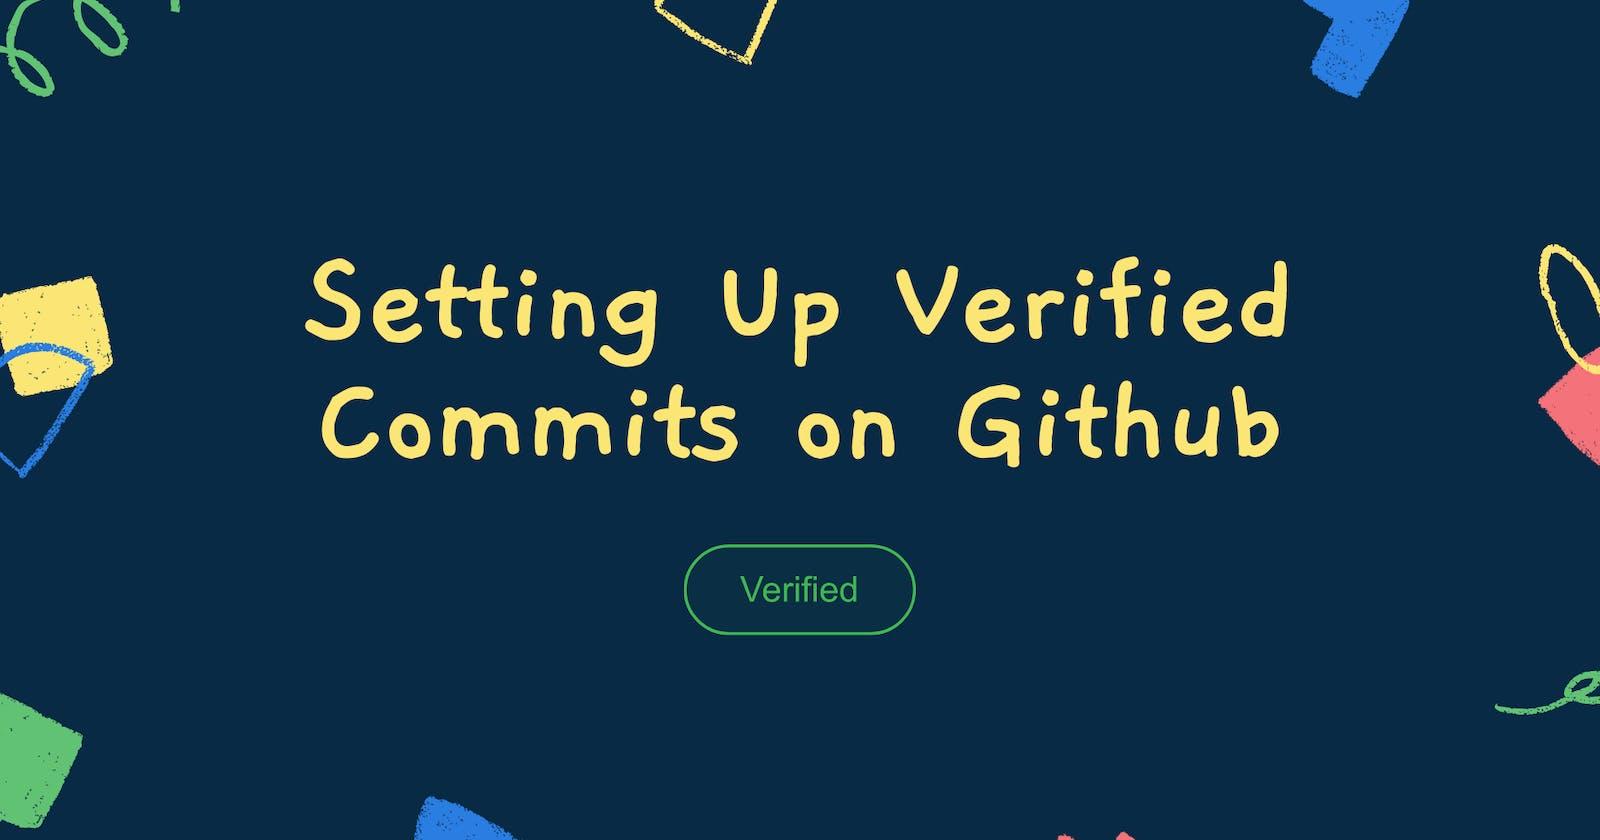 Setting Up Verified Commits On Github